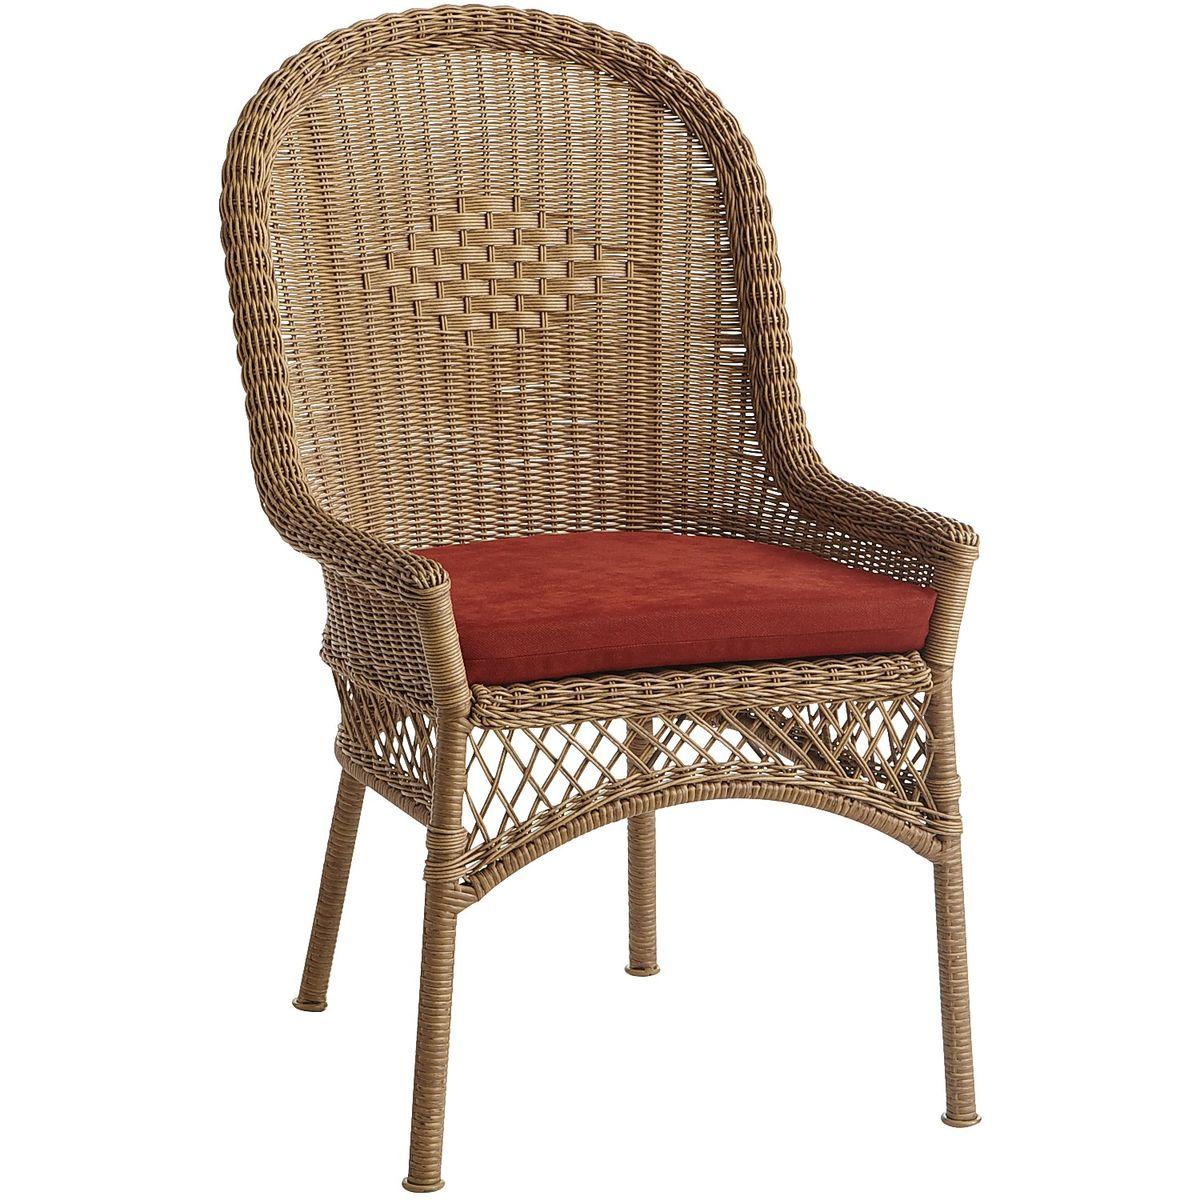 Santa Barbara Dining Chair - Light Brown